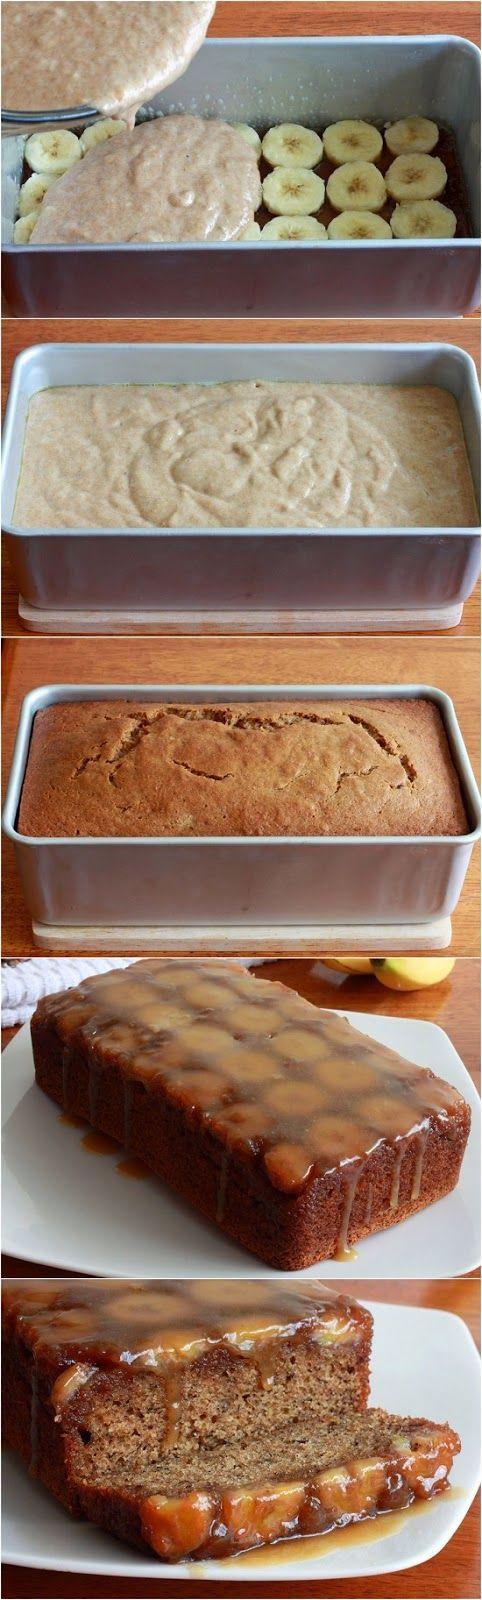 The Best Ever Upside Down Banana Bread with Caramel Glaze by DaringGourmet.com